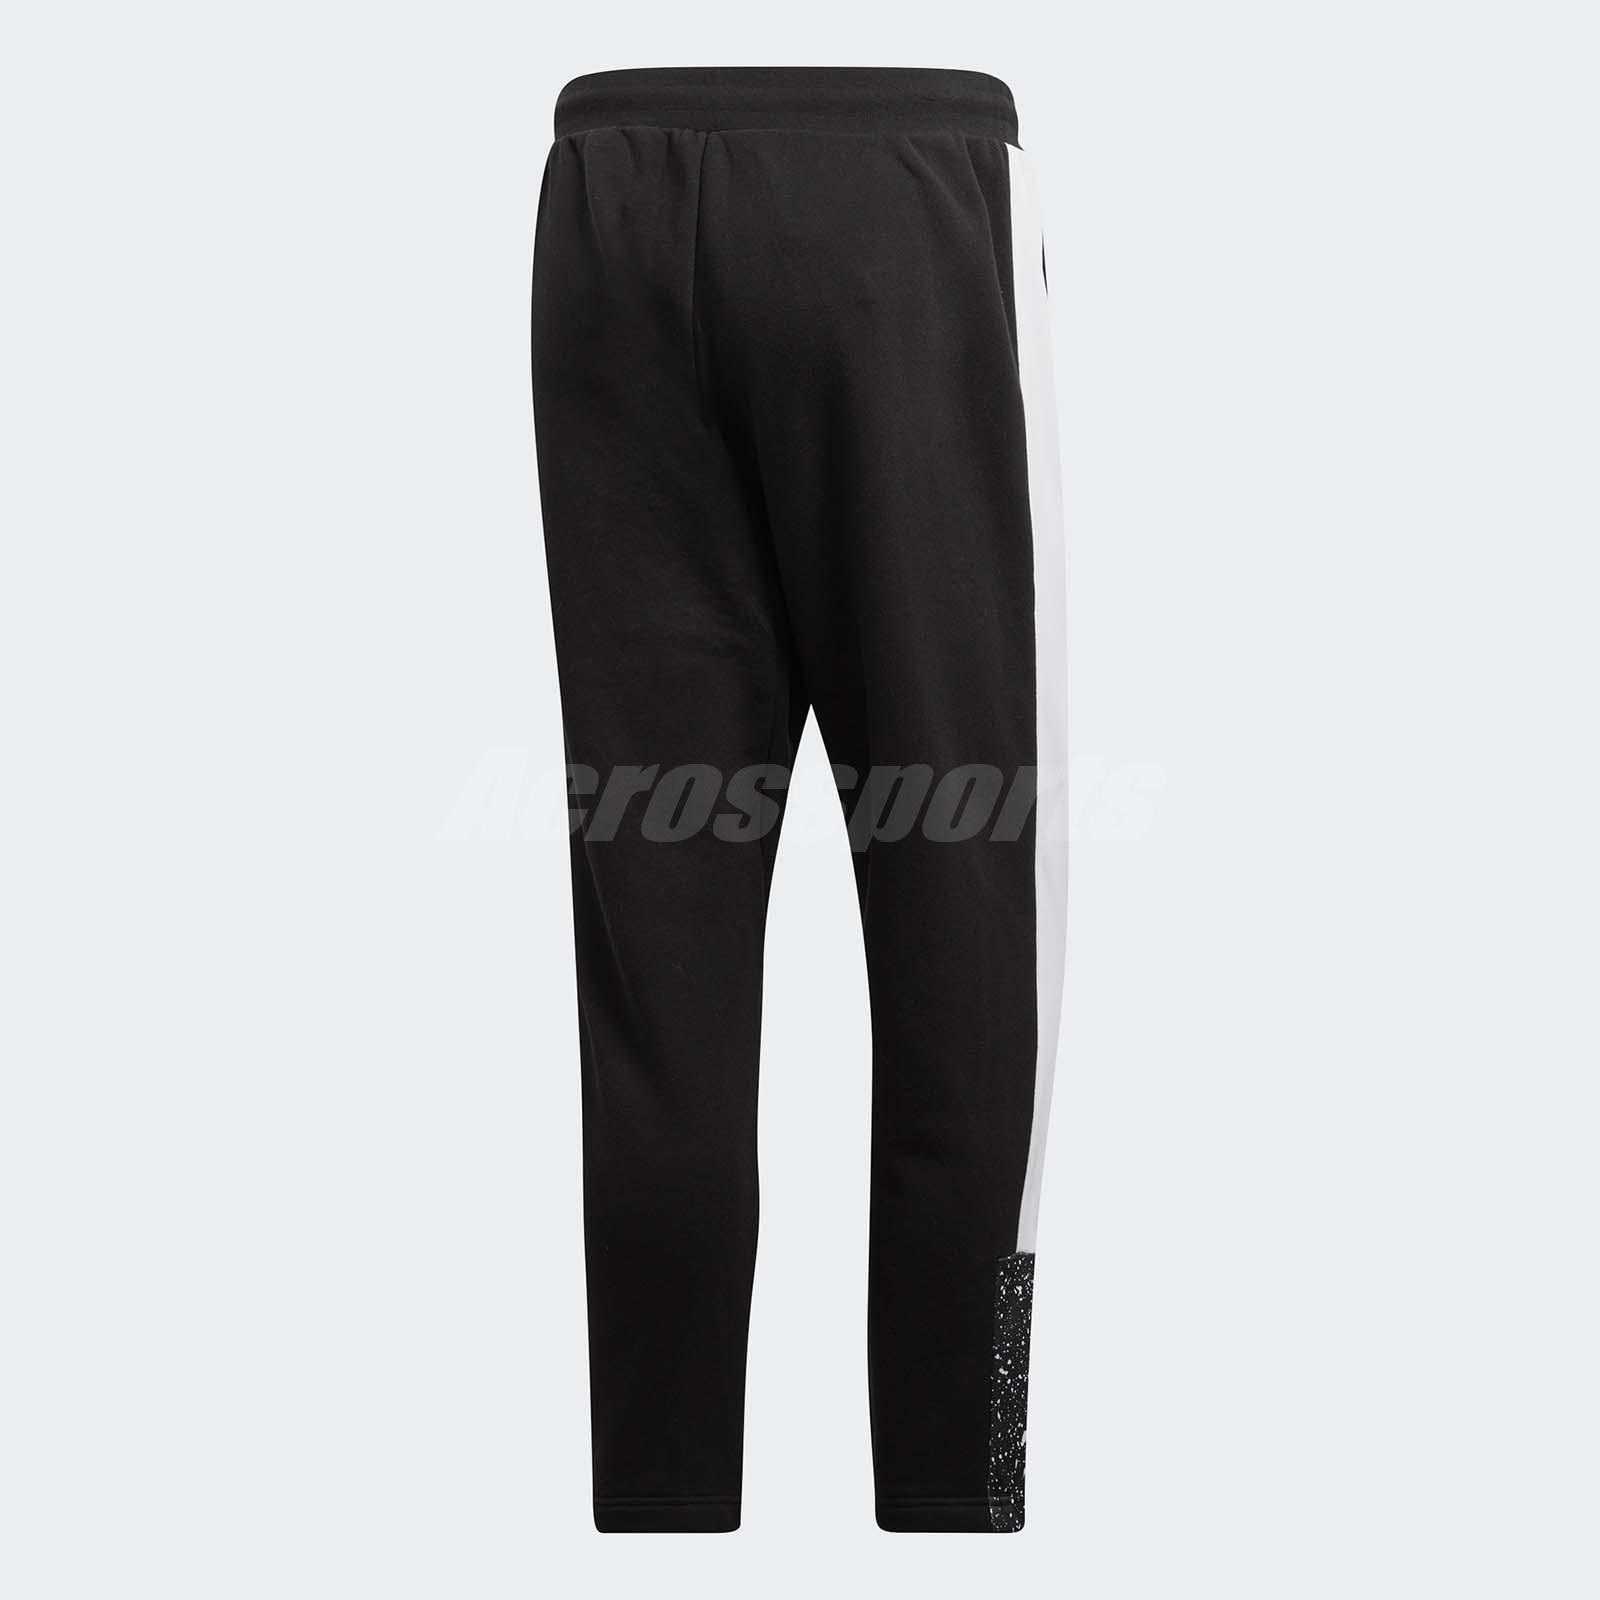 1bfc42b6defa adidas Men Originals Planetoid Sweat Pants Taper Cropped Sports Gym ...